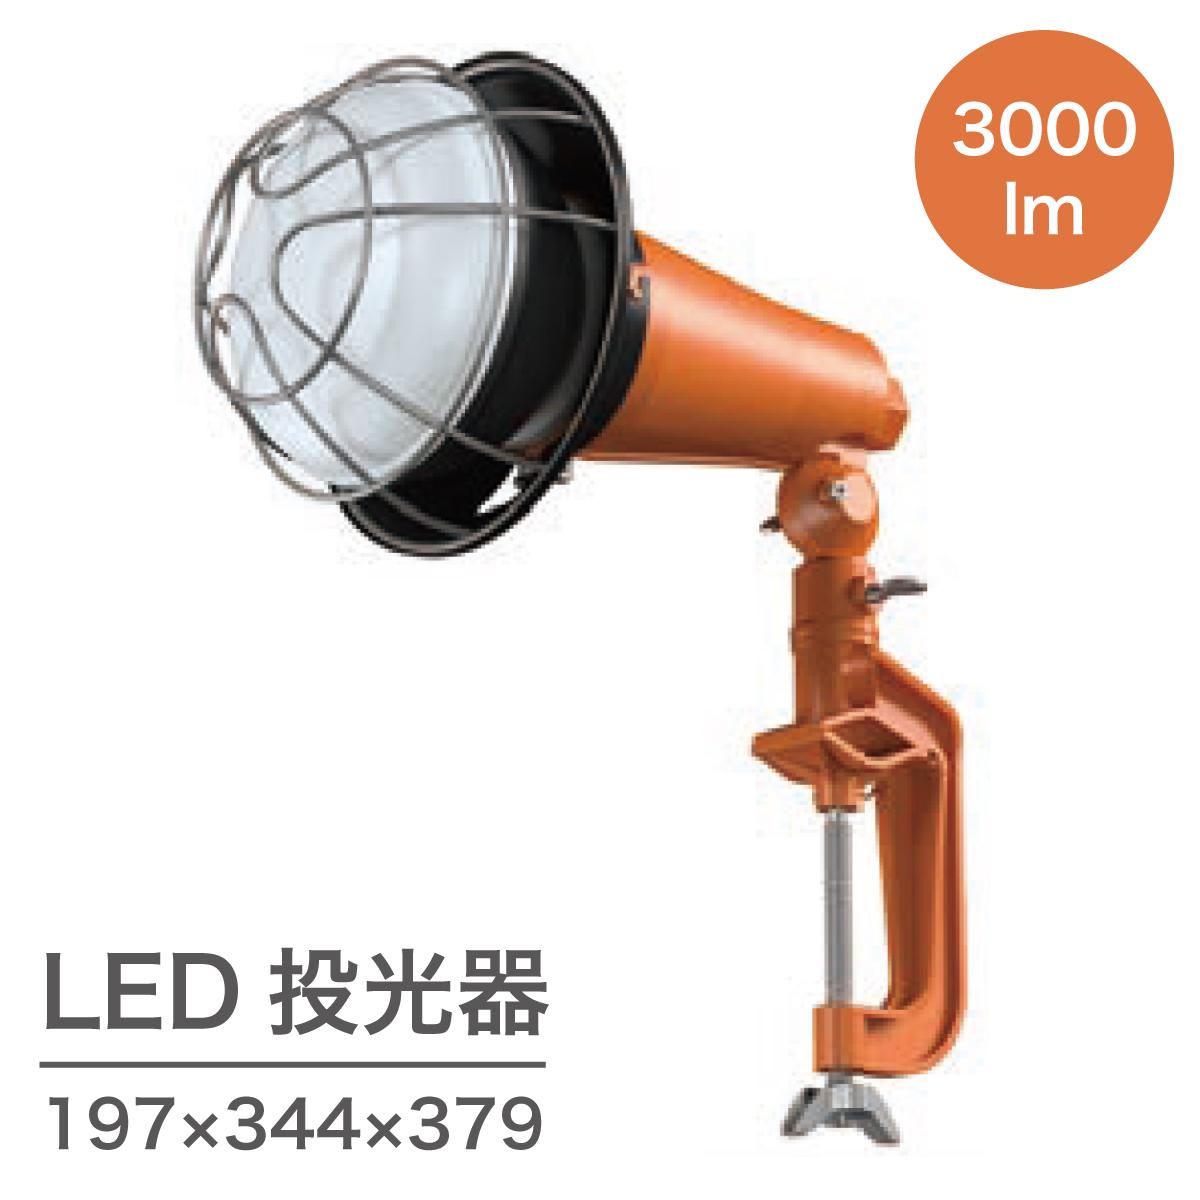 LED投光器 ワークライト 照明 省電力 長寿命 オンラインショッピング 中古 防水 LWT-3000CK197×344×379mm 000lm 防塵 ブルズLEDワークライトシリーズ 3